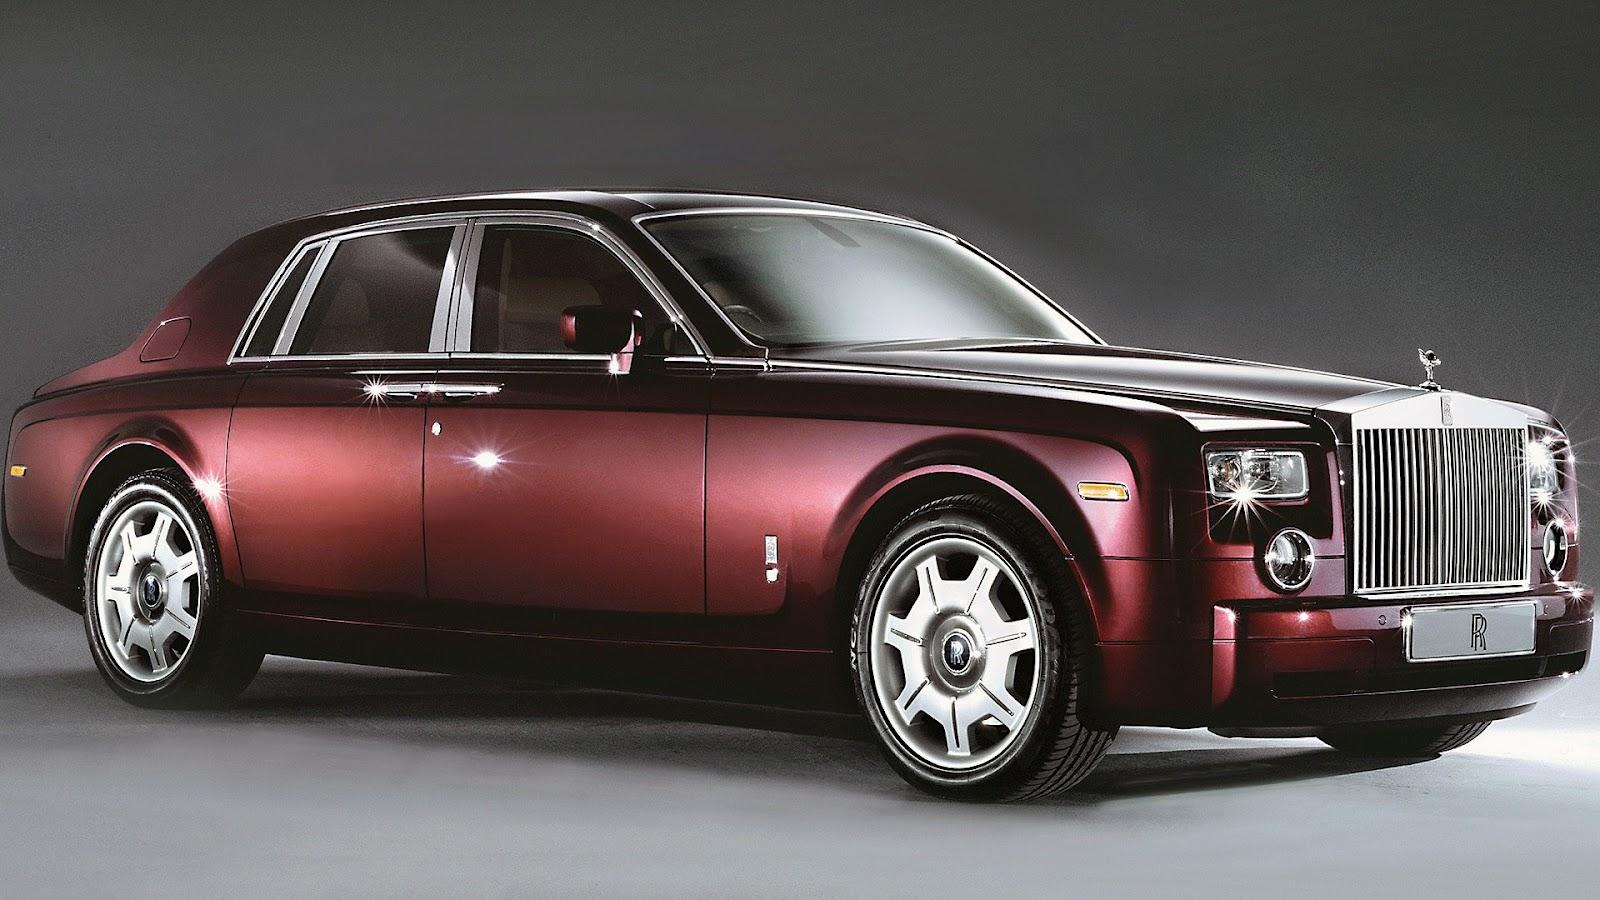 Royal Royce Car Hd Wallpaper Auto Wallpapers Hd Wallpapers